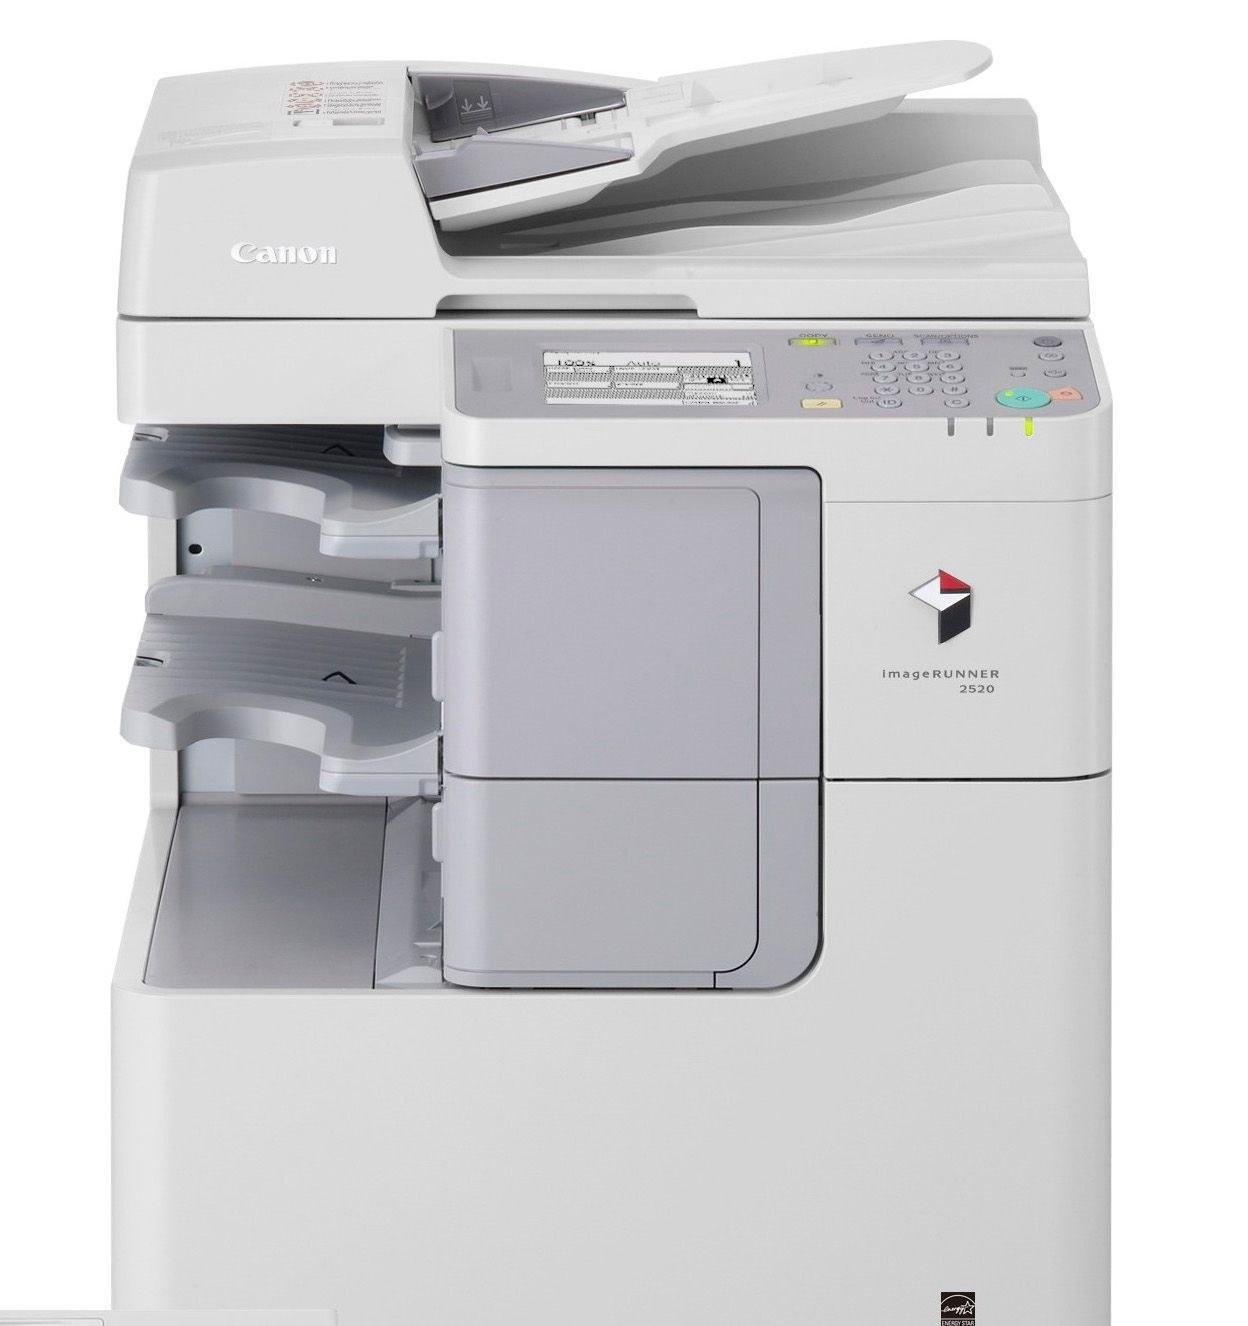 تصویر فتوکپی CANON imageRUNNER 2520 Canon imageRUNNER 2520 - Office Black & White Printers